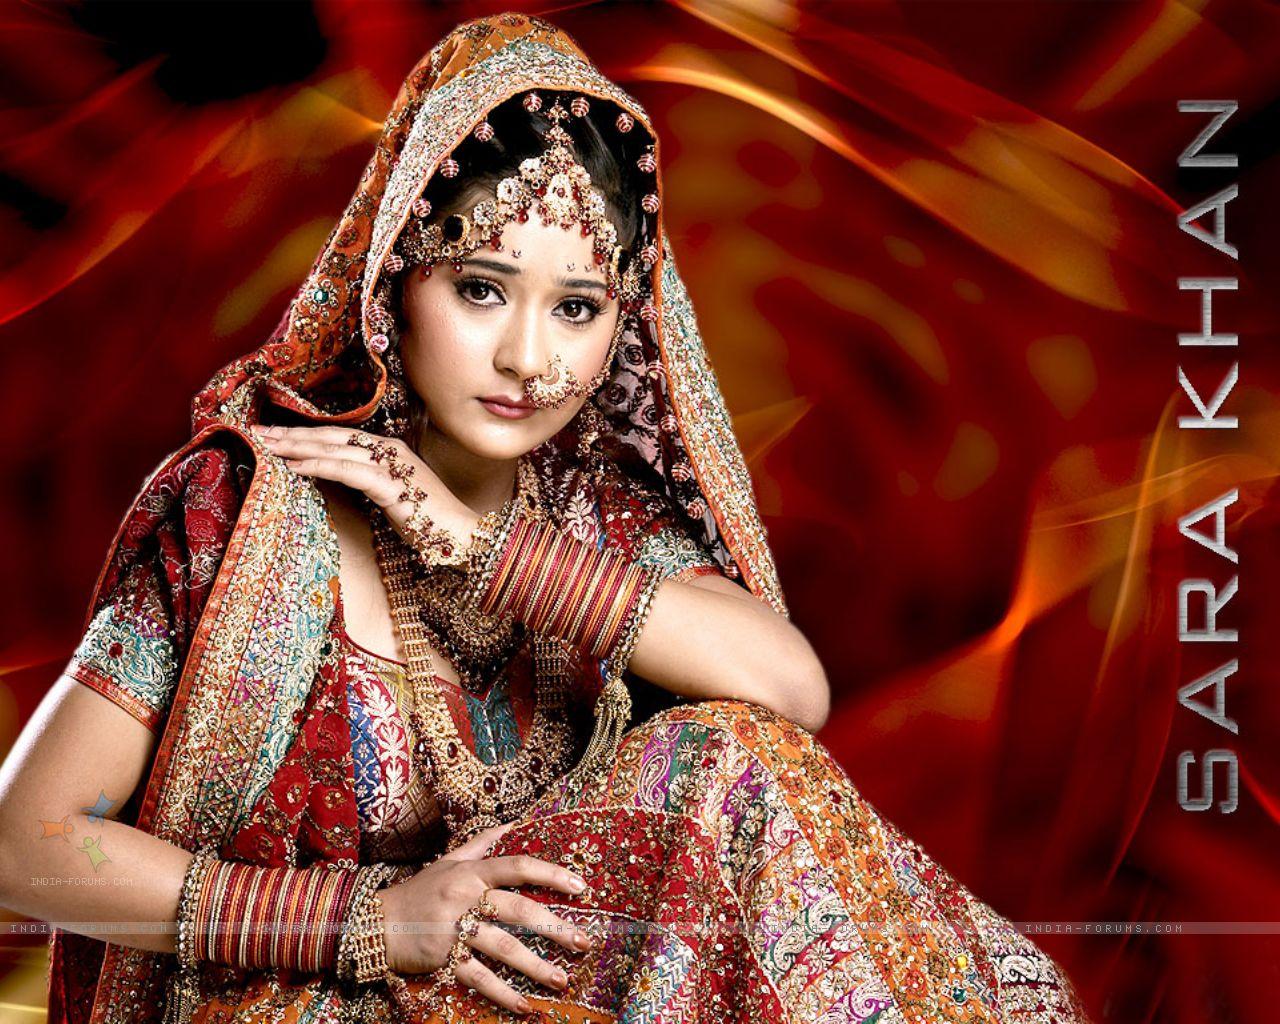 Free Wallpapers Download, Desktop Nature Bollywood Sports ...Sara Khan In Saree